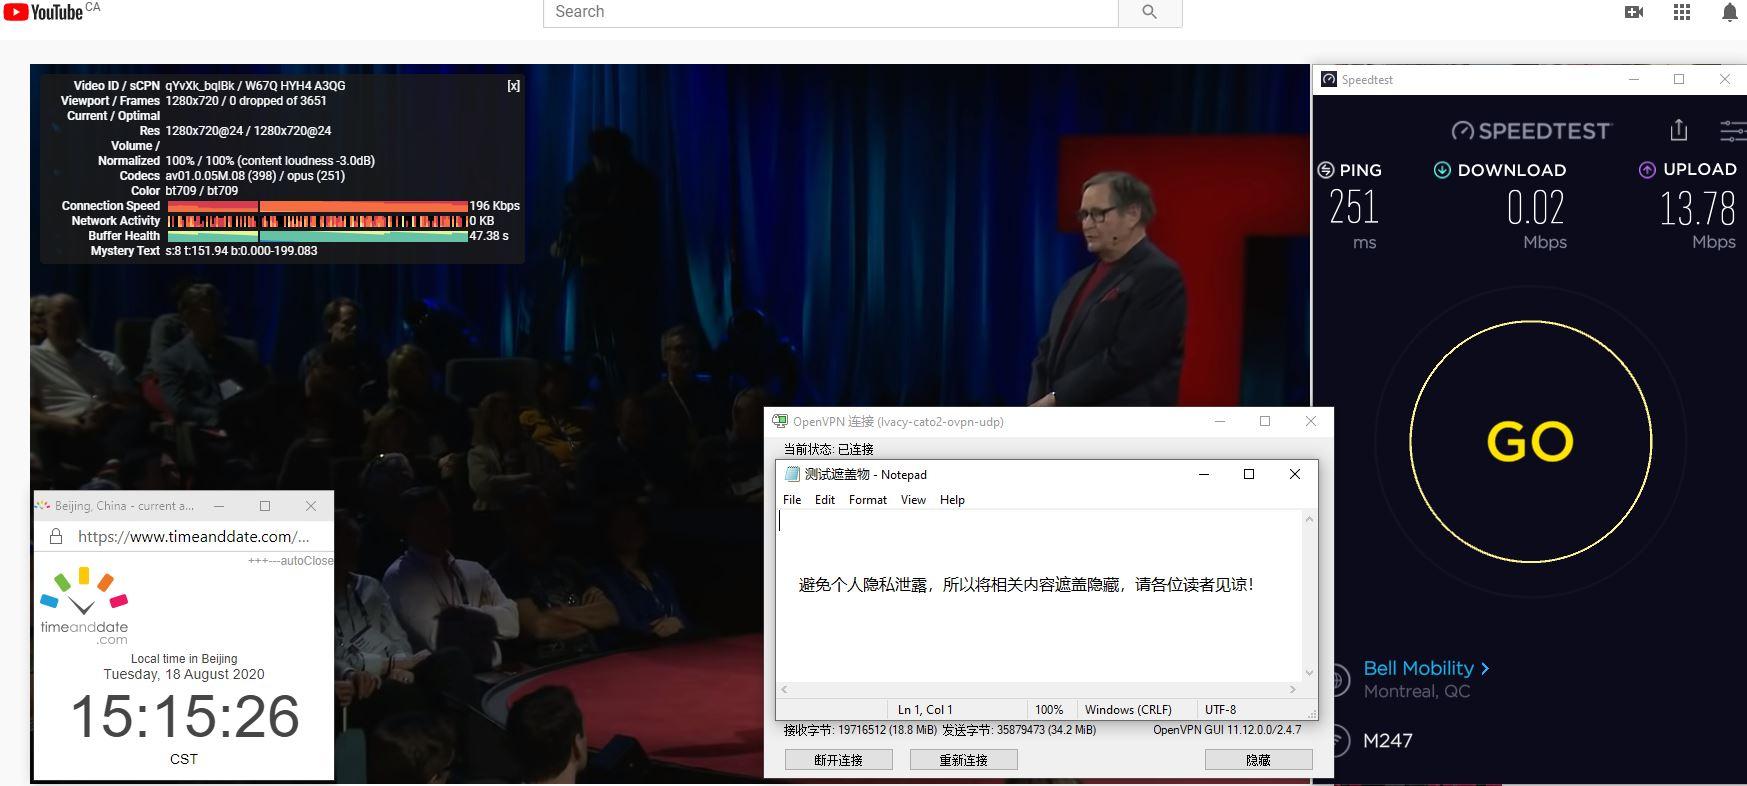 Windows10 IvacyVPN OpenVPN cato2 中国VPN 翻墙 科学上网 翻墙速度测试 - 20200818